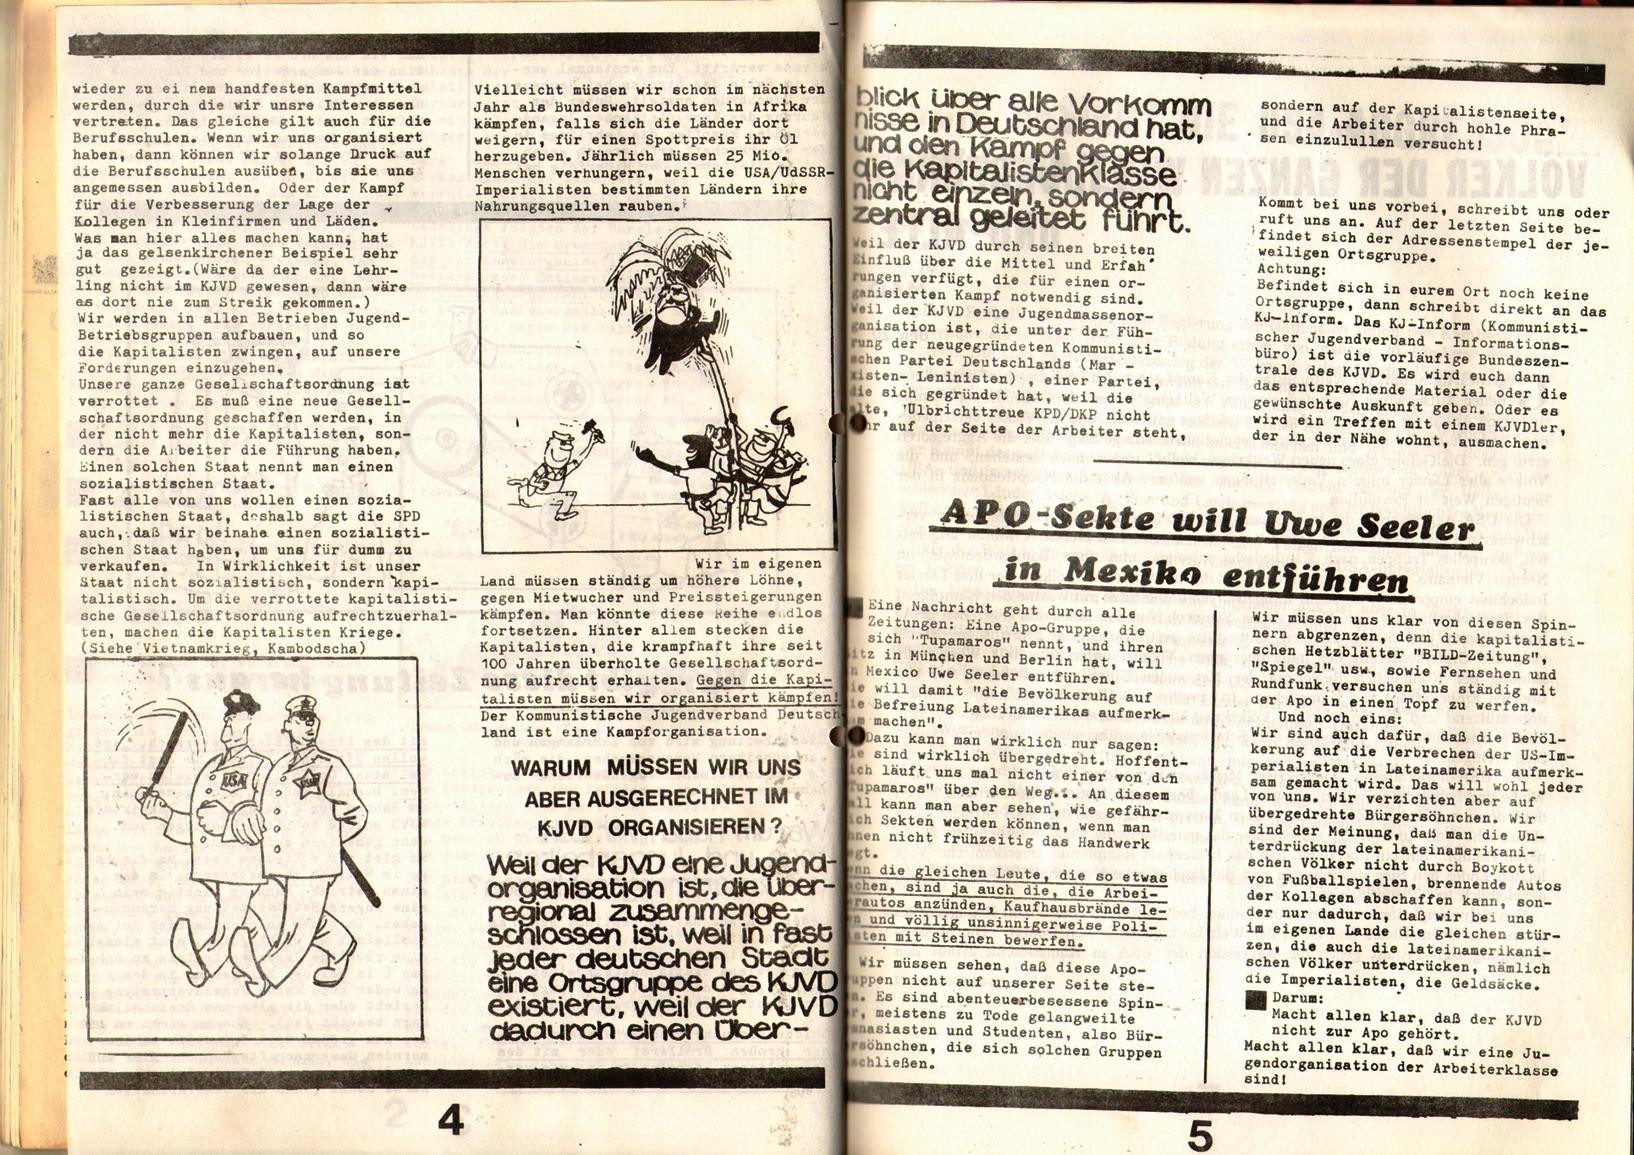 KDAJ, 1. Jg., 1970, Nr. 2, Seite 4+5